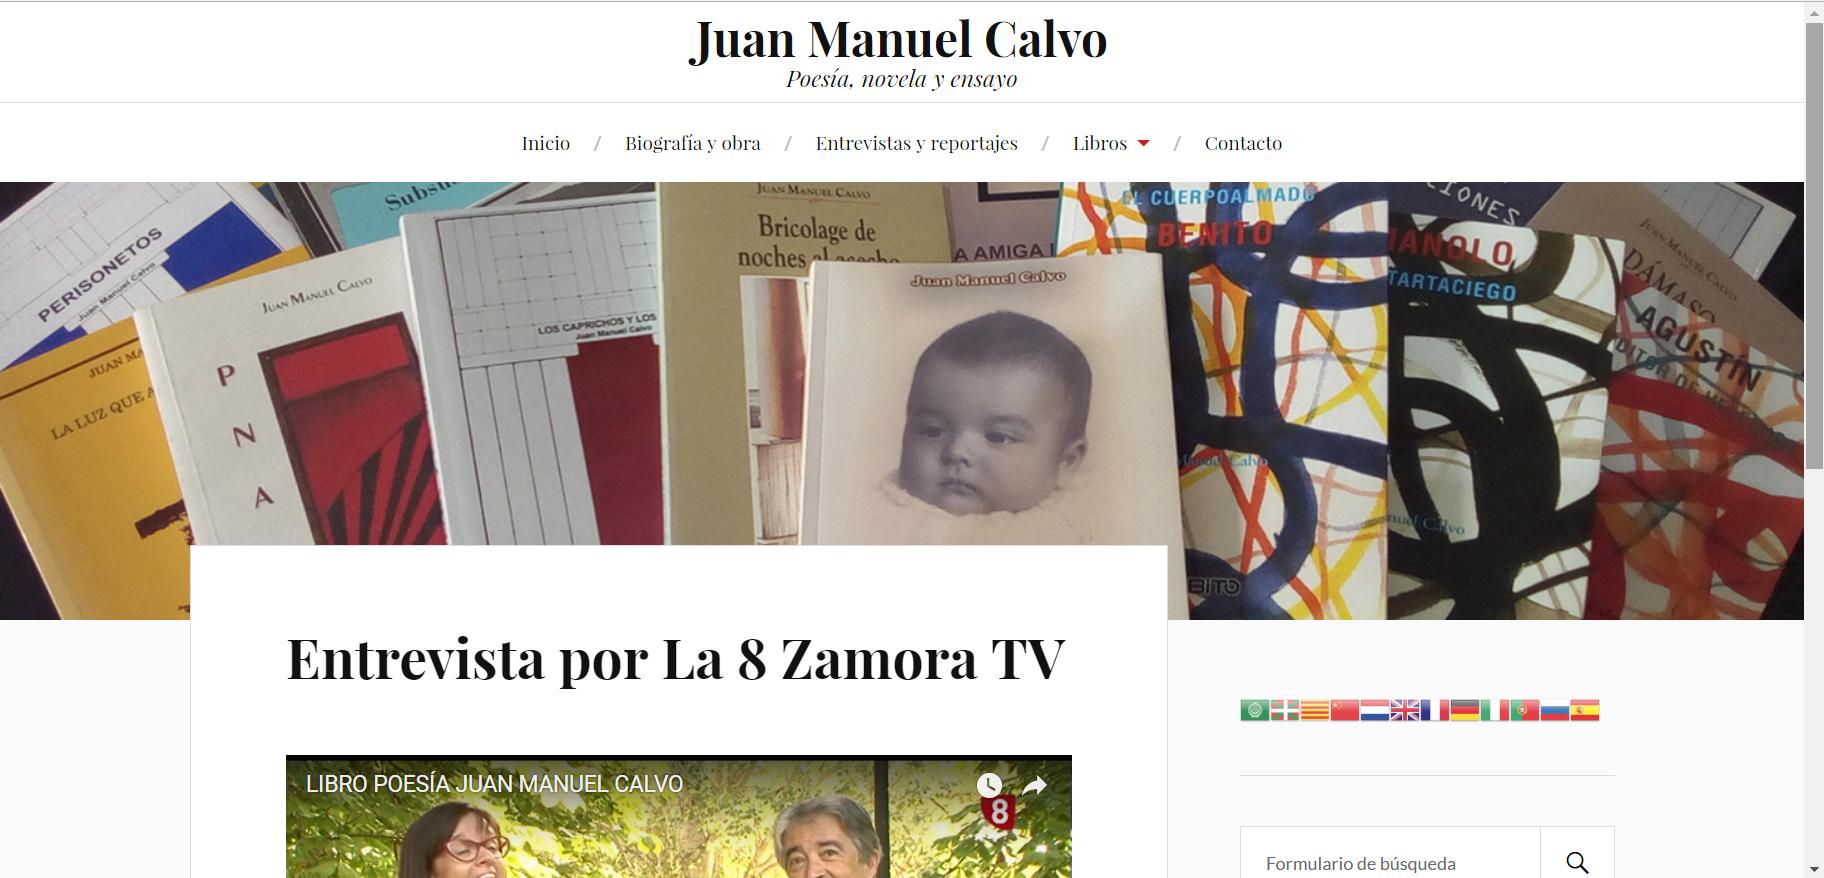 Juan Manuel Calvo